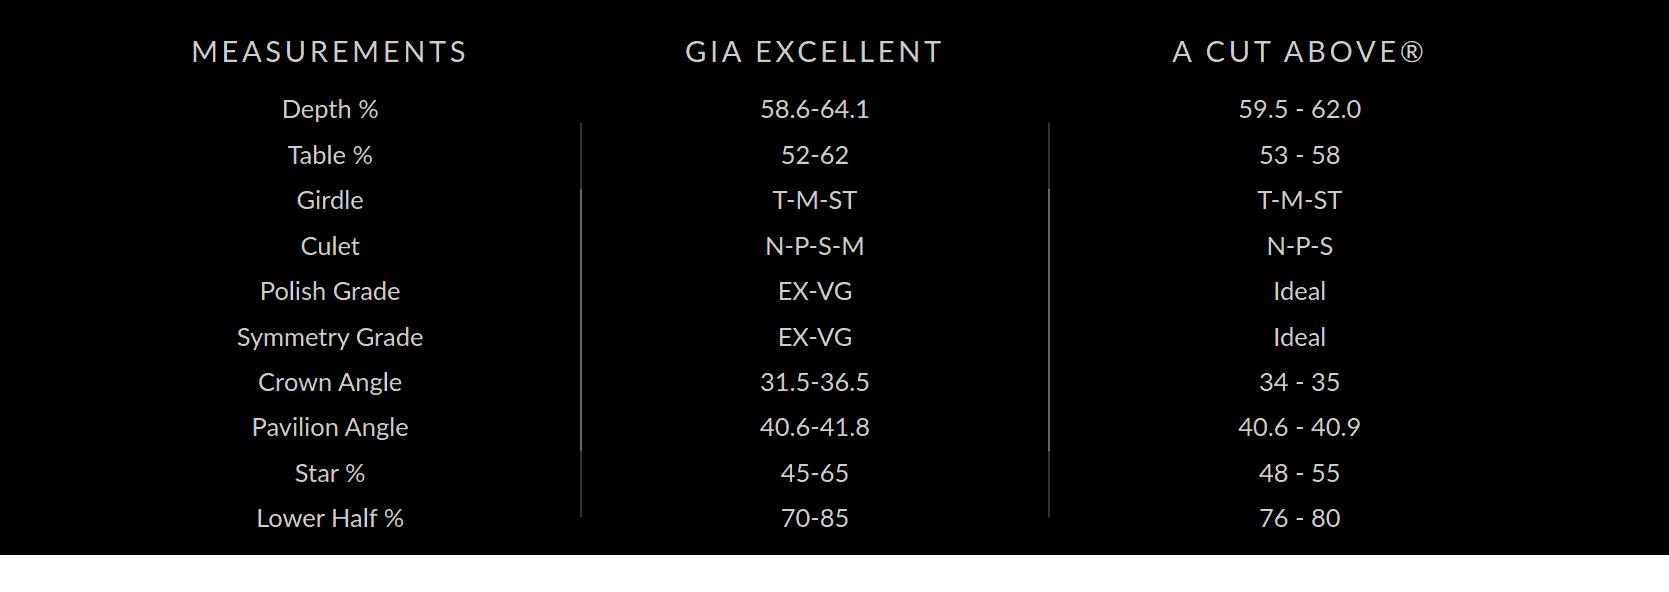 A Cut Above Diamond Measurement Specifications